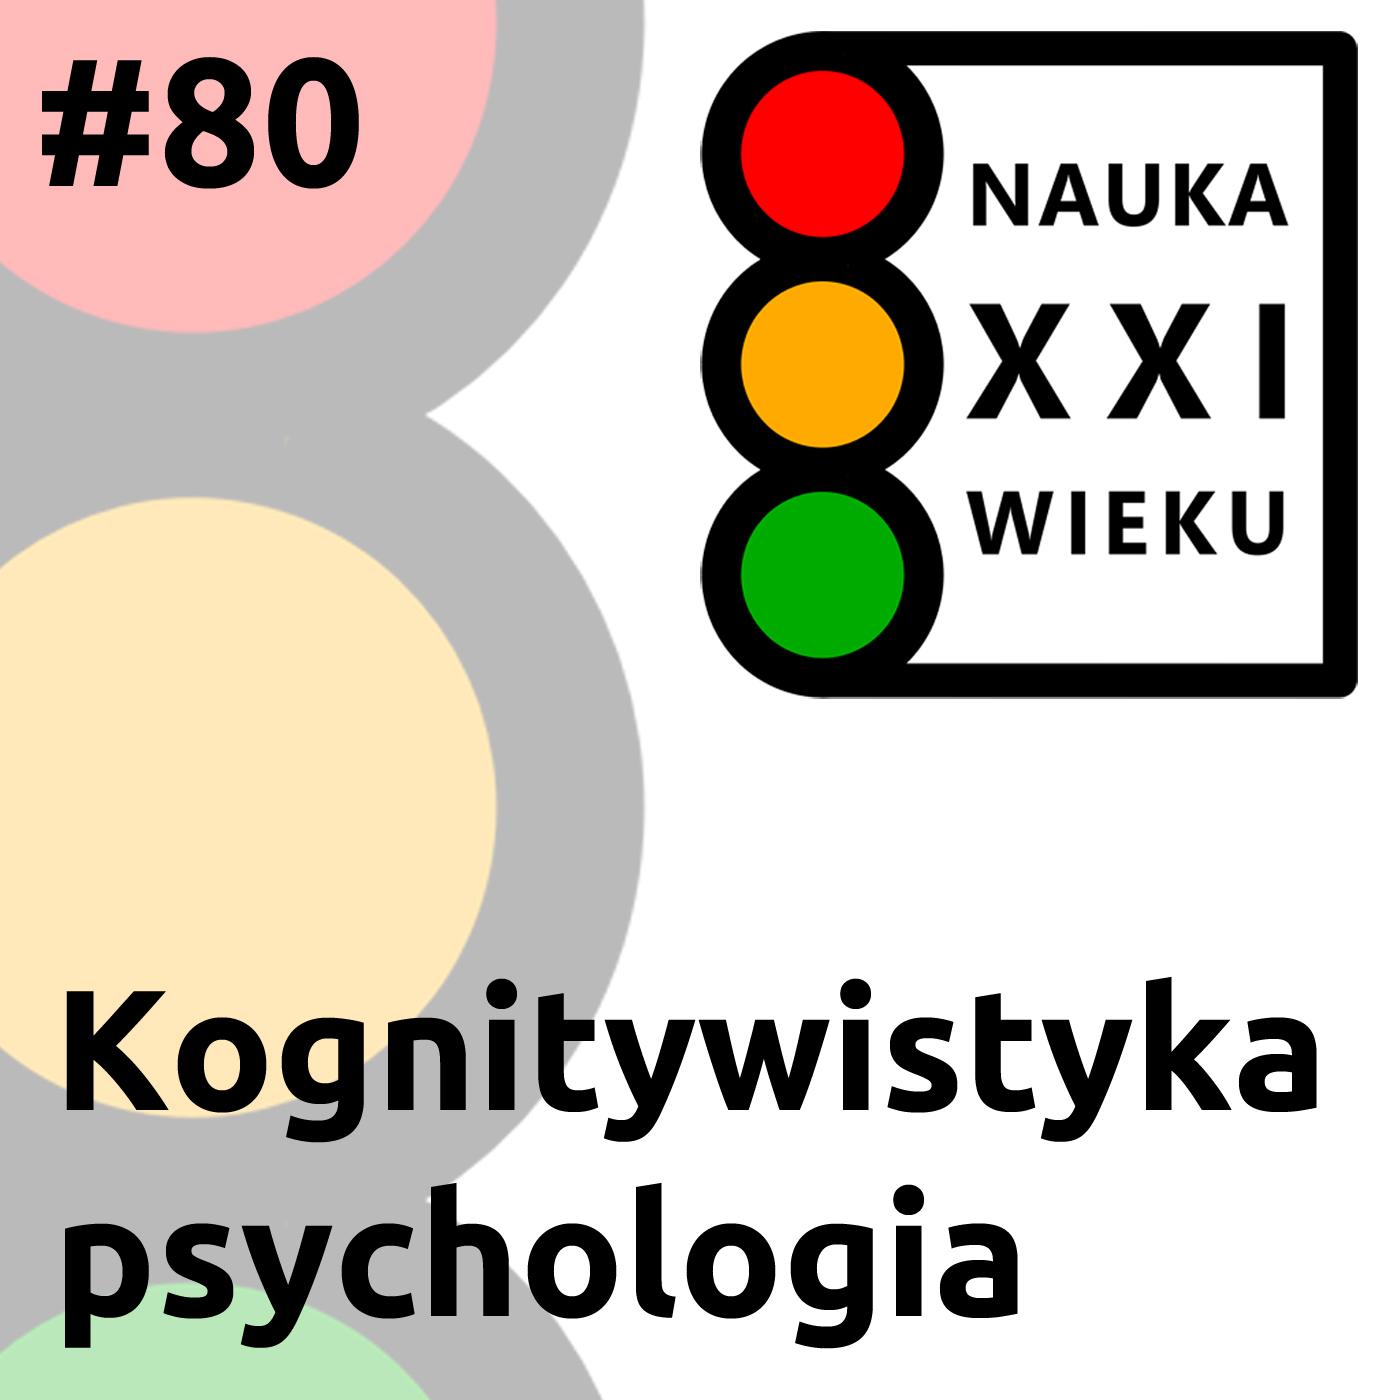 #80 - Kognitywistyka, psychologia